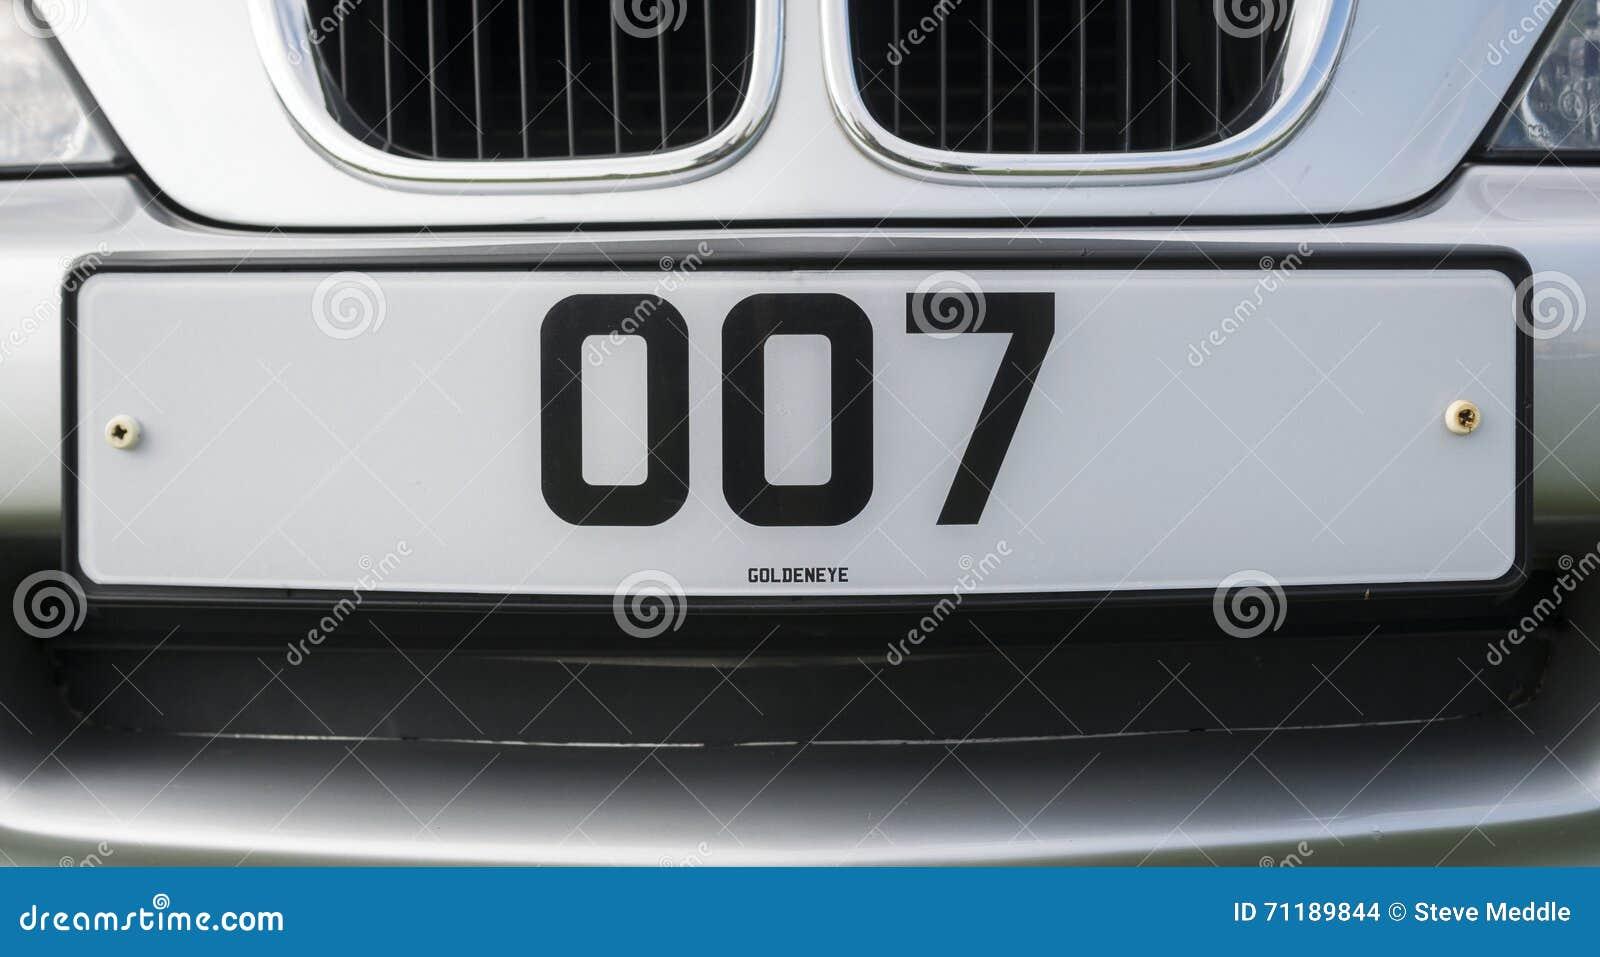 Número de matrícula personalizado de James Bond 007